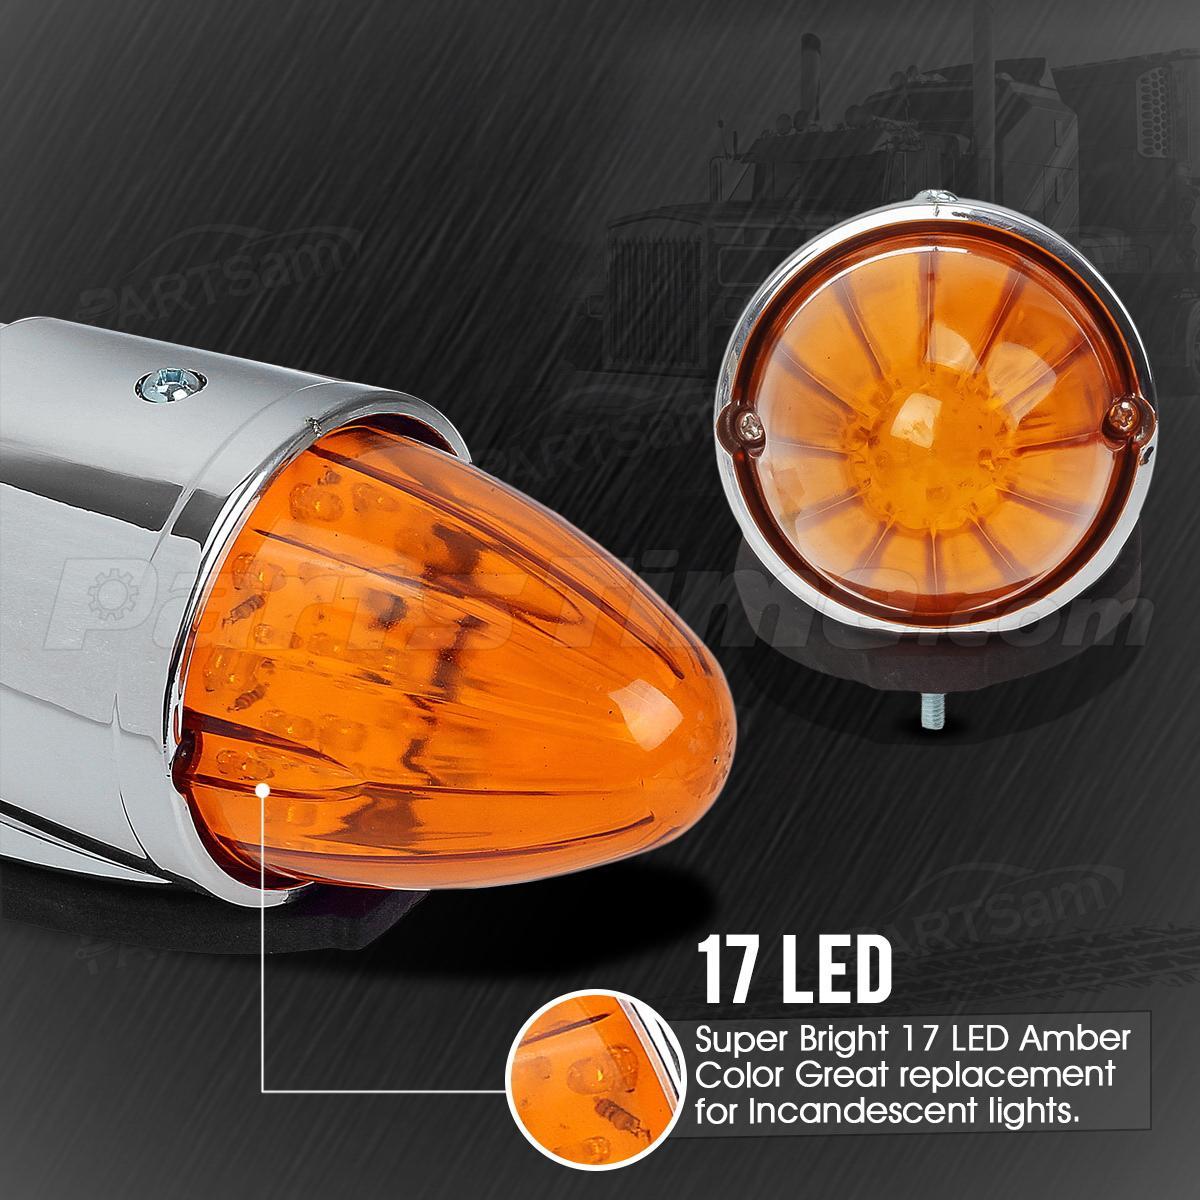 Led Lights For Semi Trucks >> Universal 17 LED Amber Torpedo Cab Roof Top Marker Light For Peterbilt Kenworth   eBay